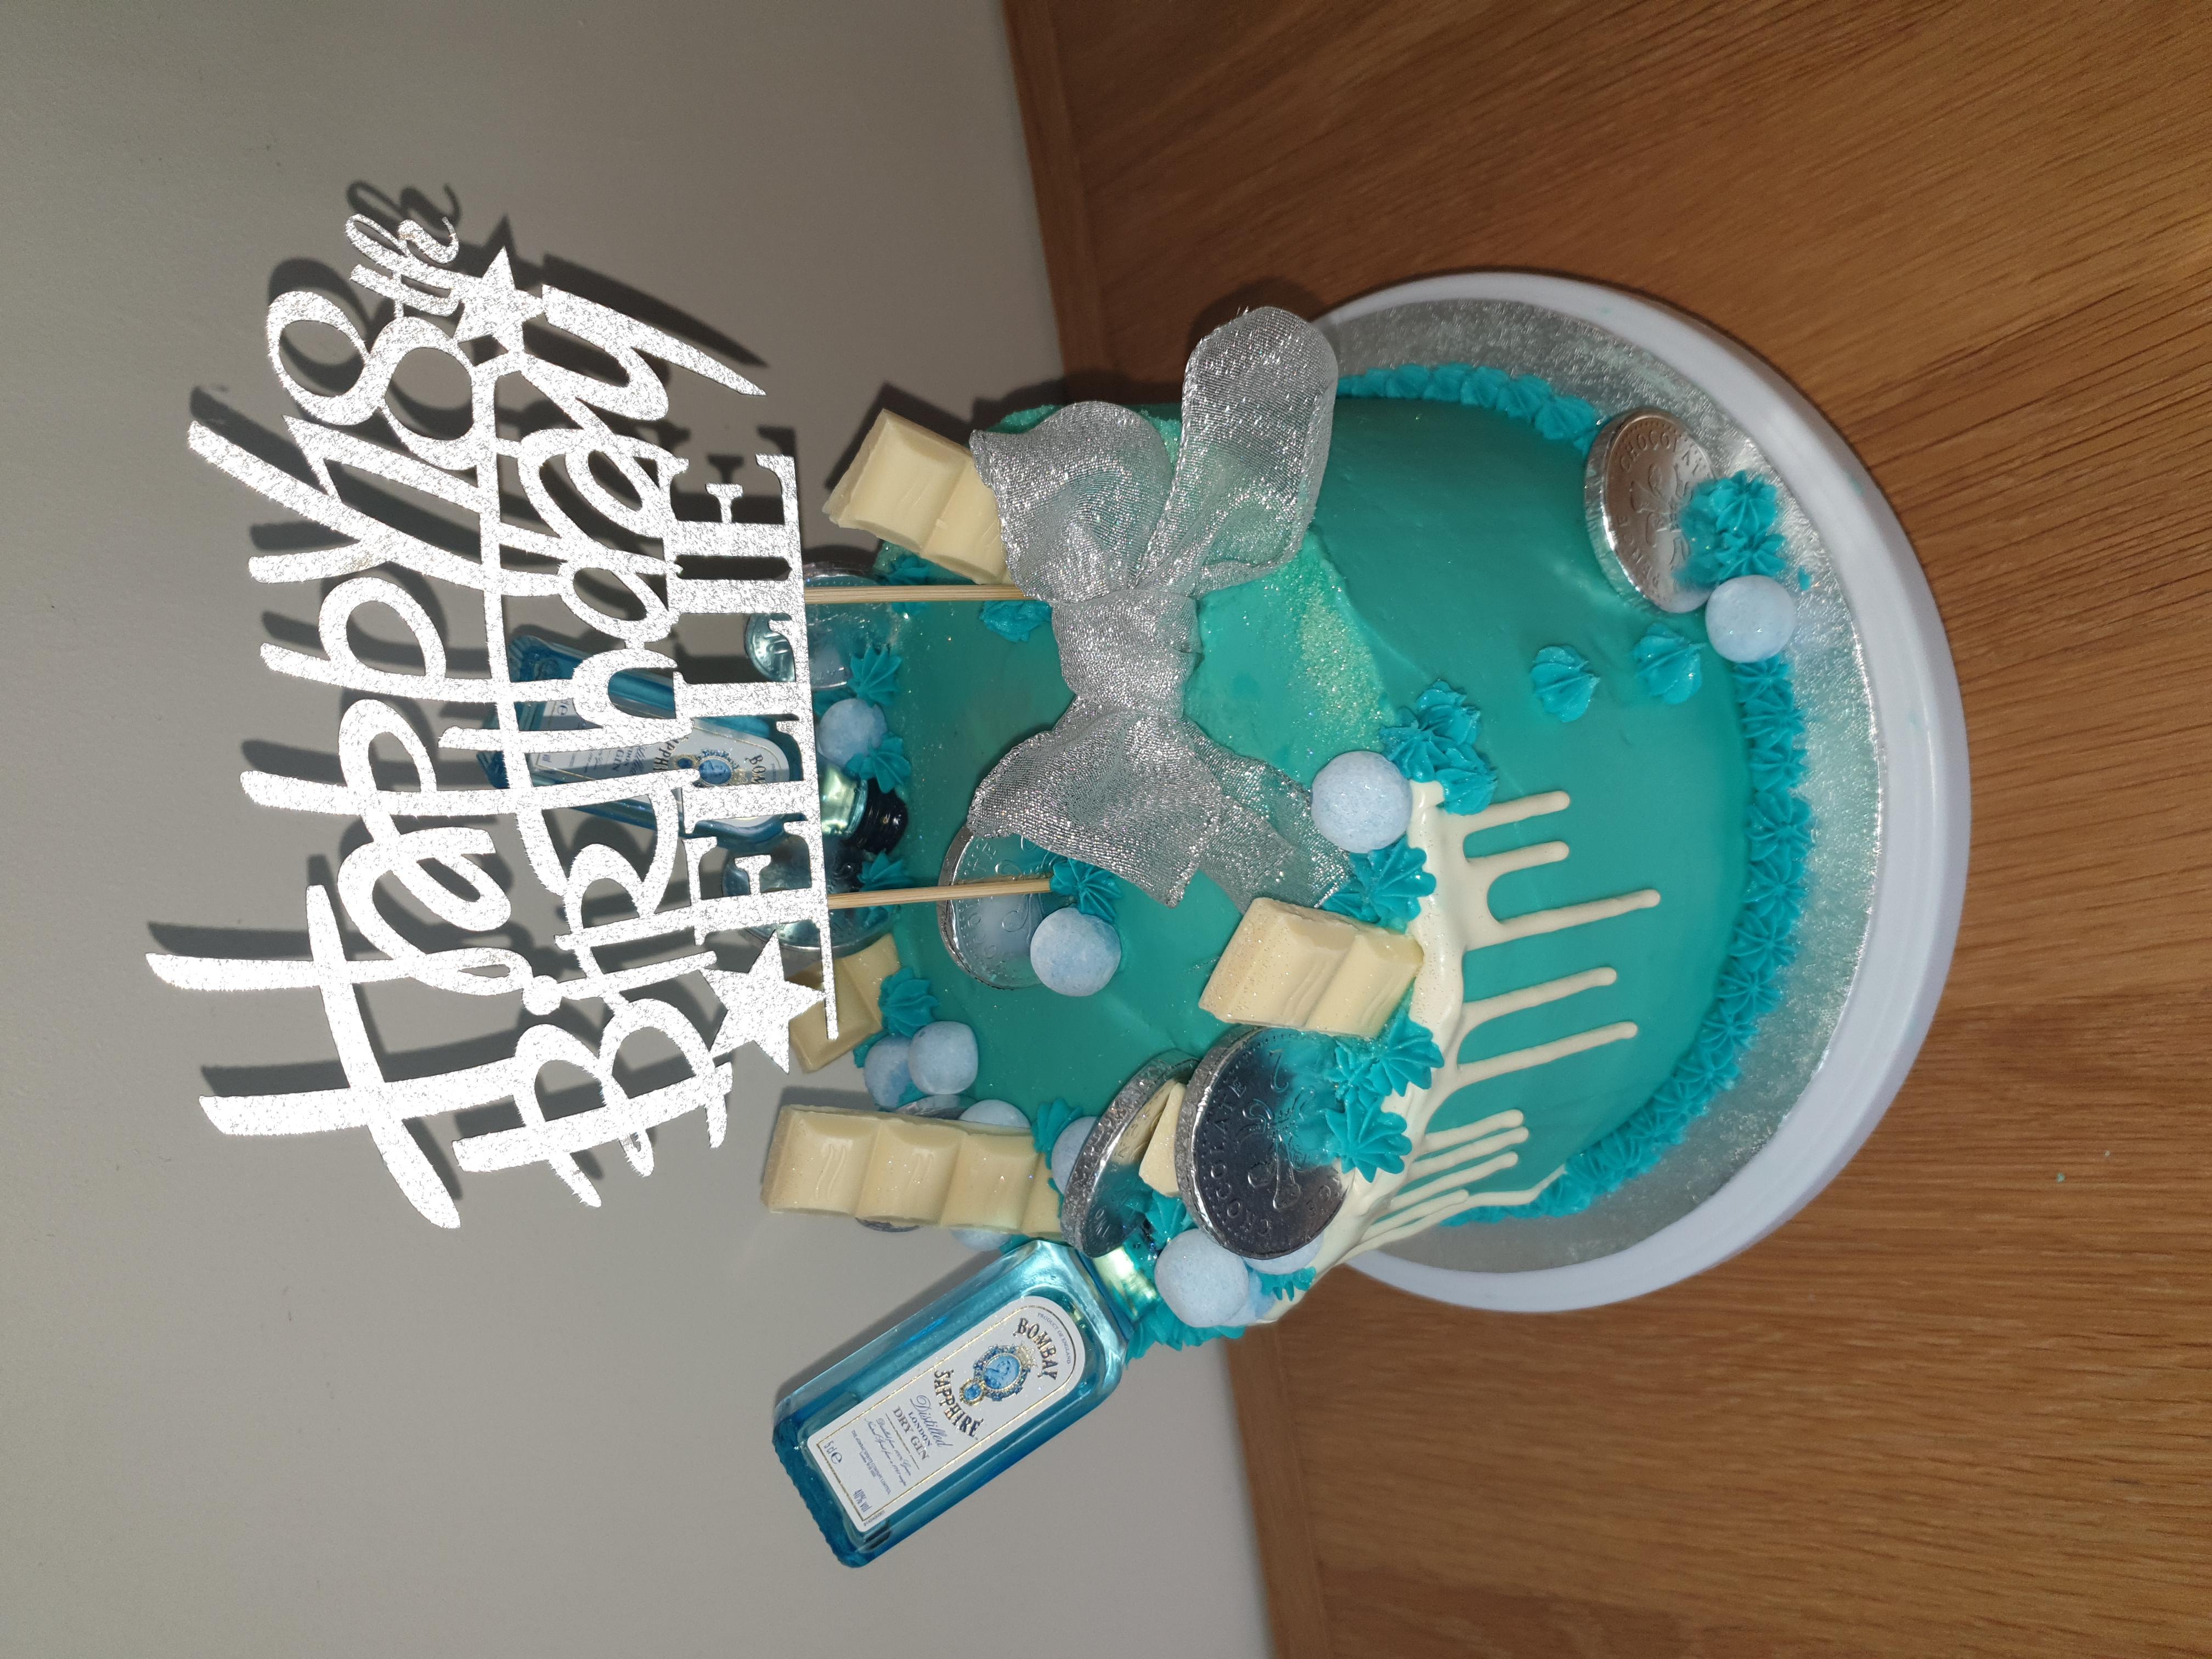 bombay sapphire cake